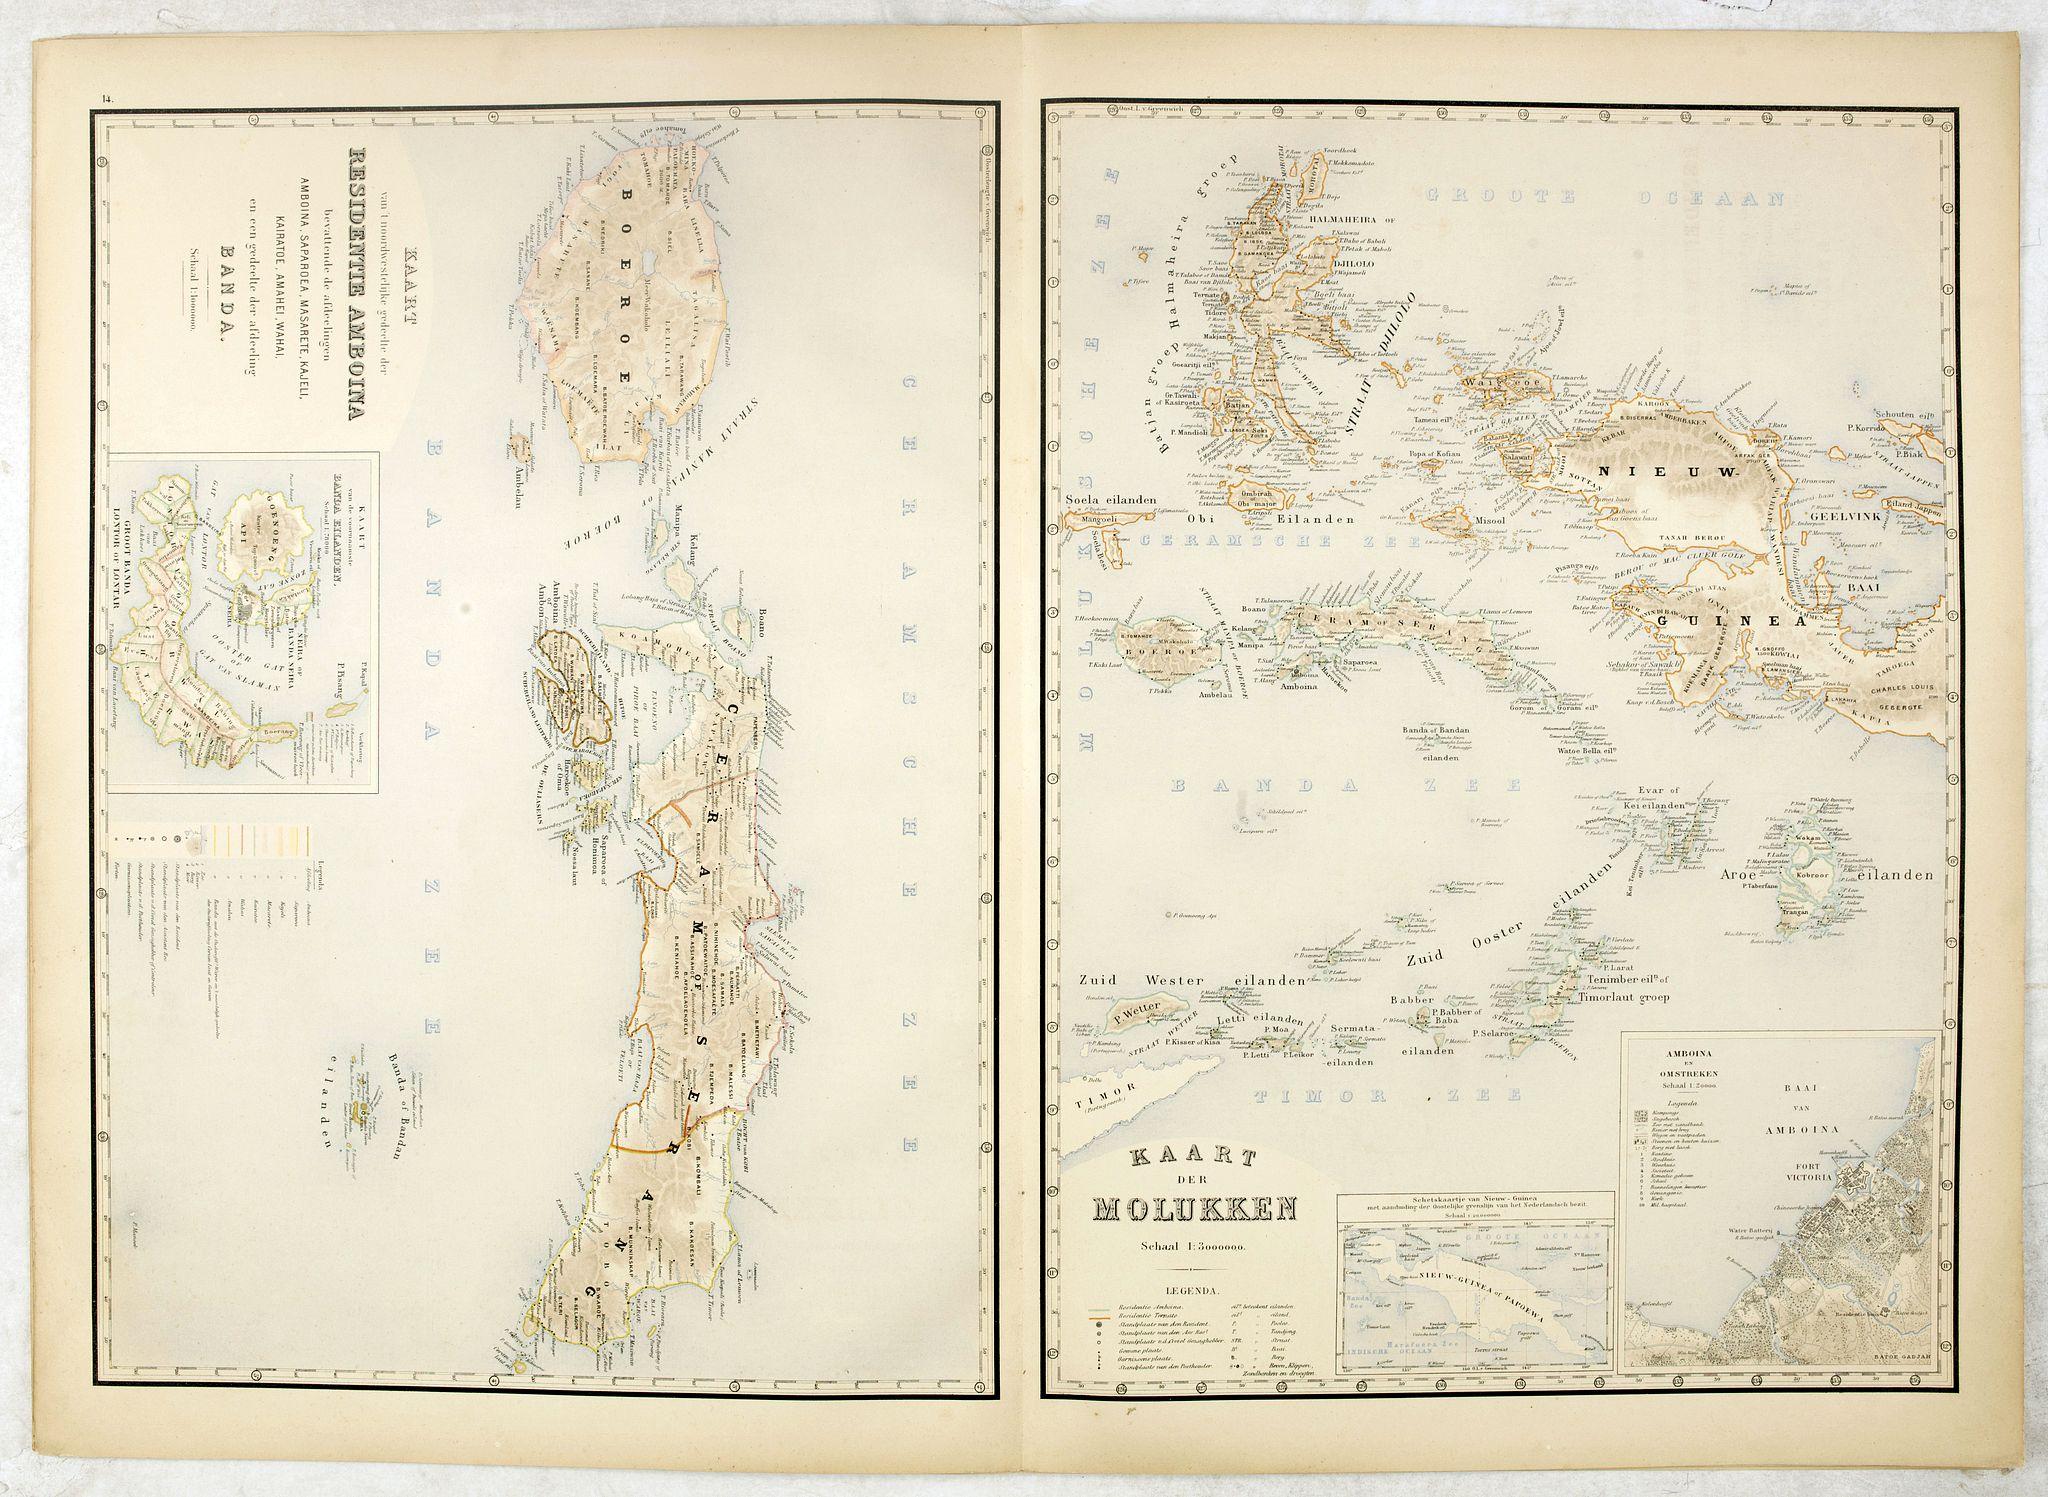 STEMFOORT, J.W. / SIETHOFF, J.J. -  Kaart van't noordwestelijke gedeelte der Residentie Amboina . . . / Kaart der Molukken.